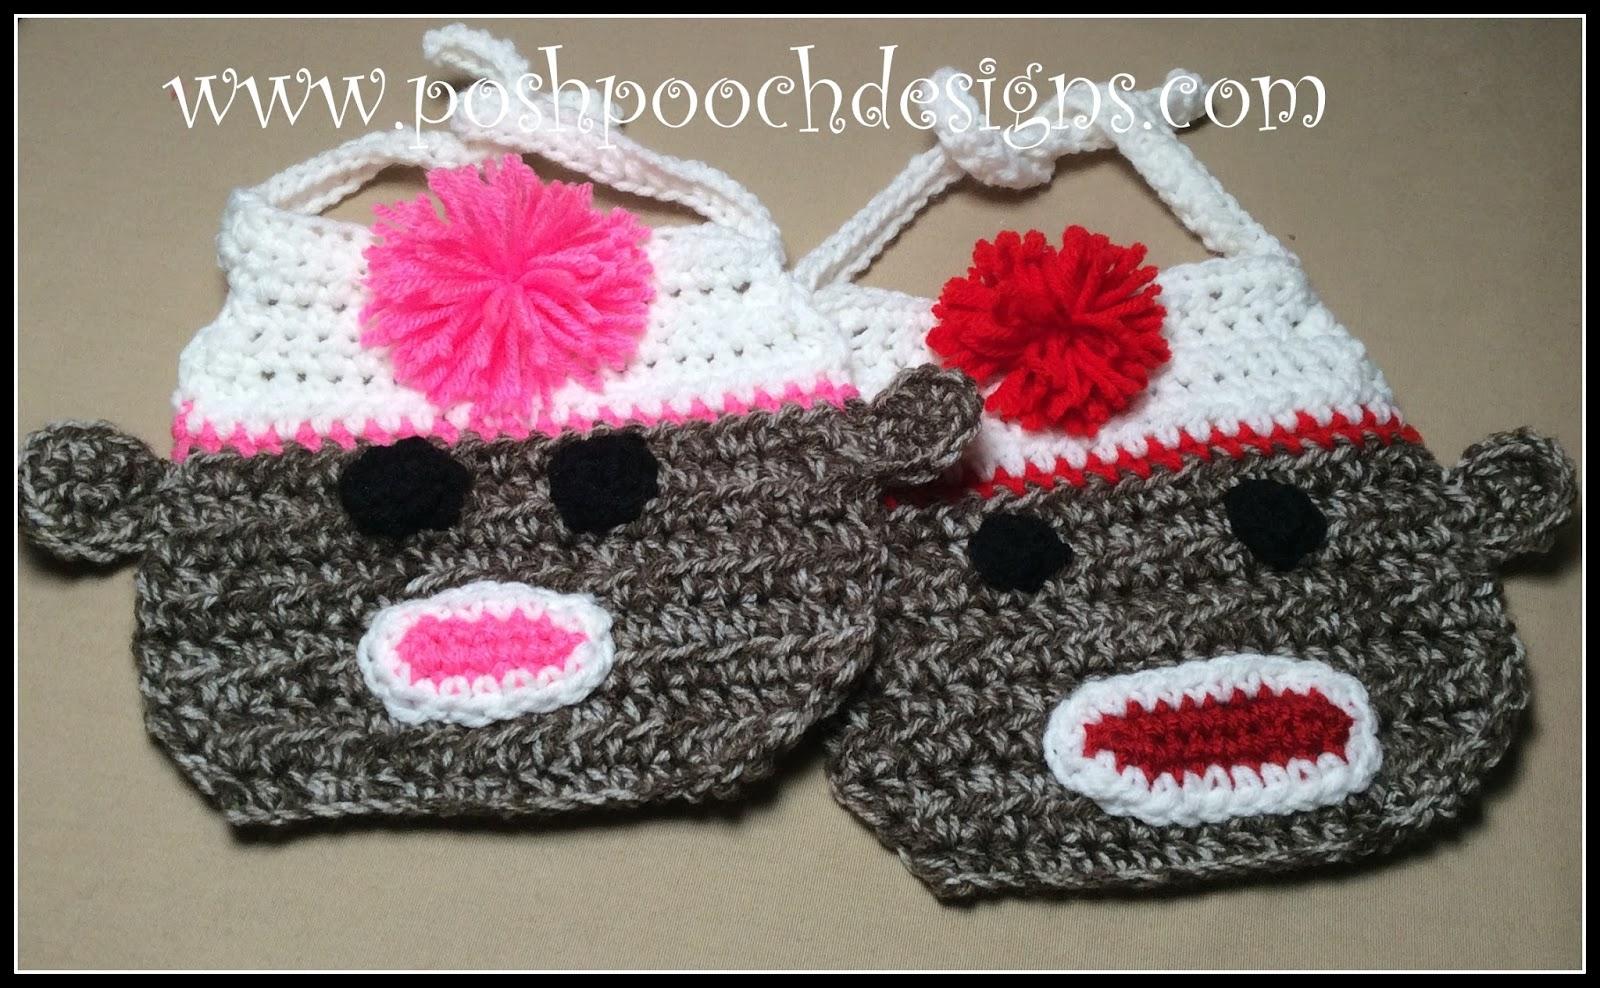 Posh Pooch Designs Dog Clothes: Sock Monkey Baby Bib Crochet Pattern ...